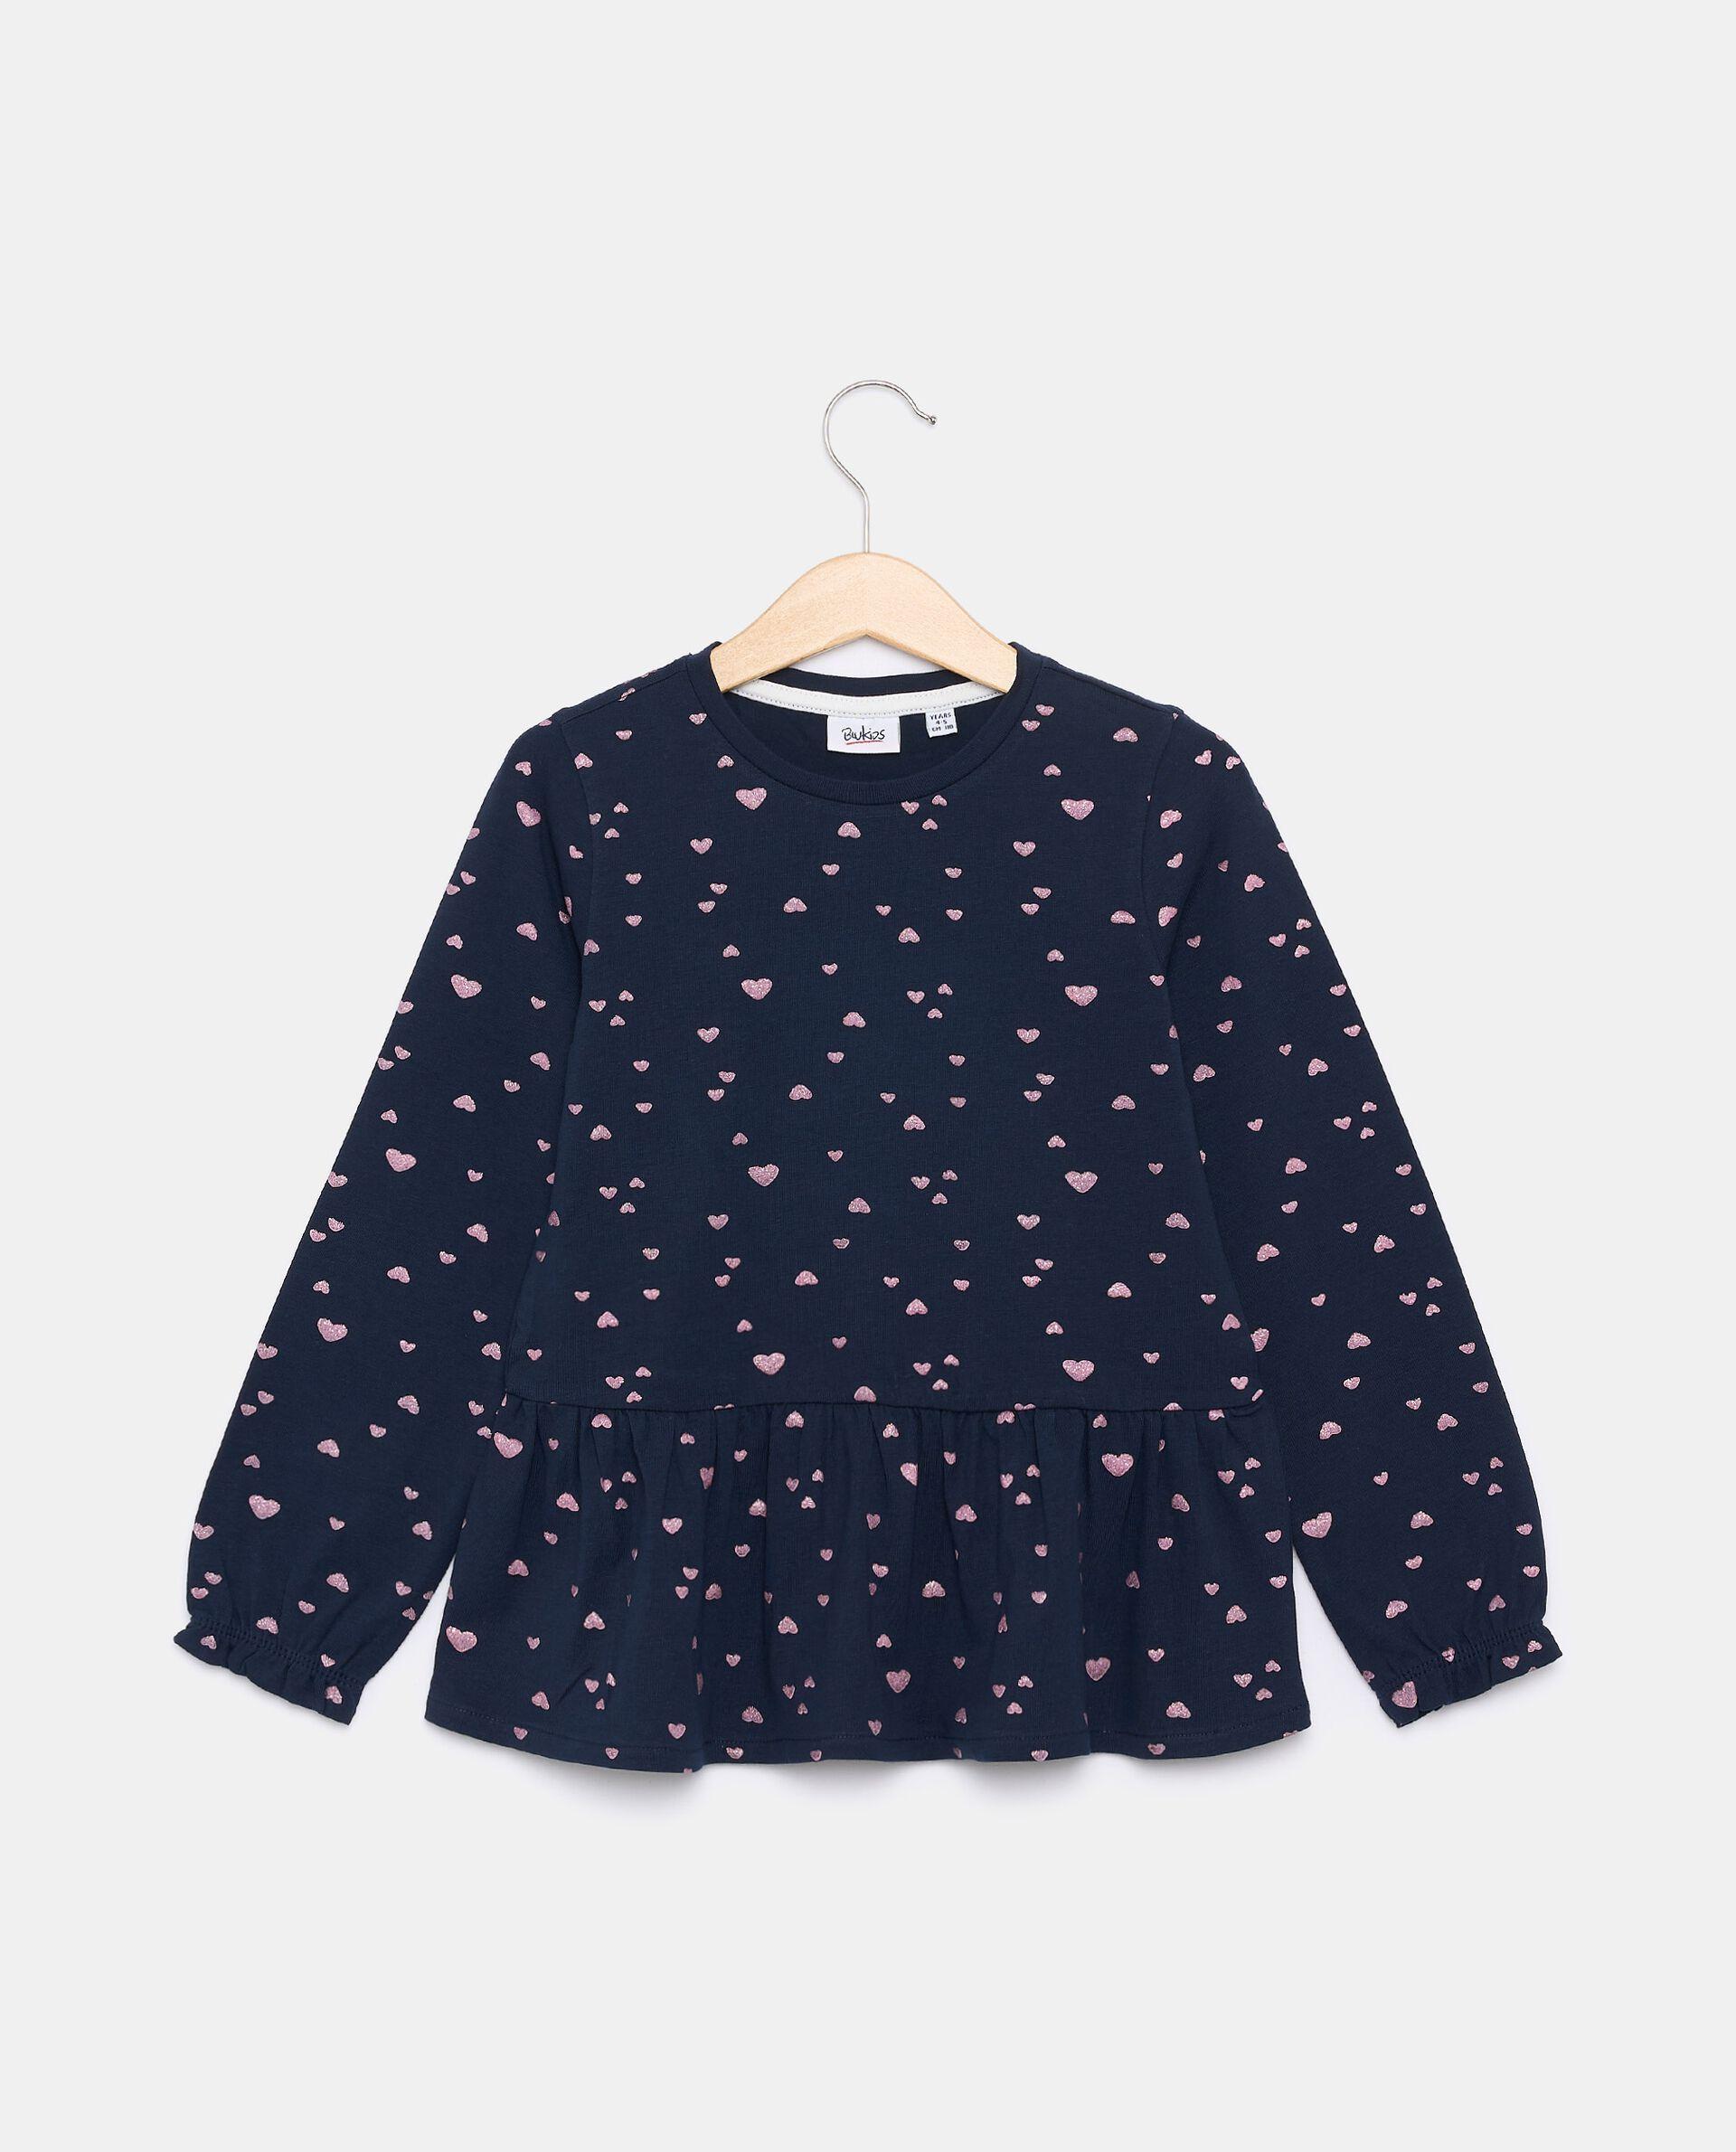 T-shirt in jersey stretch in cotone organico bambina